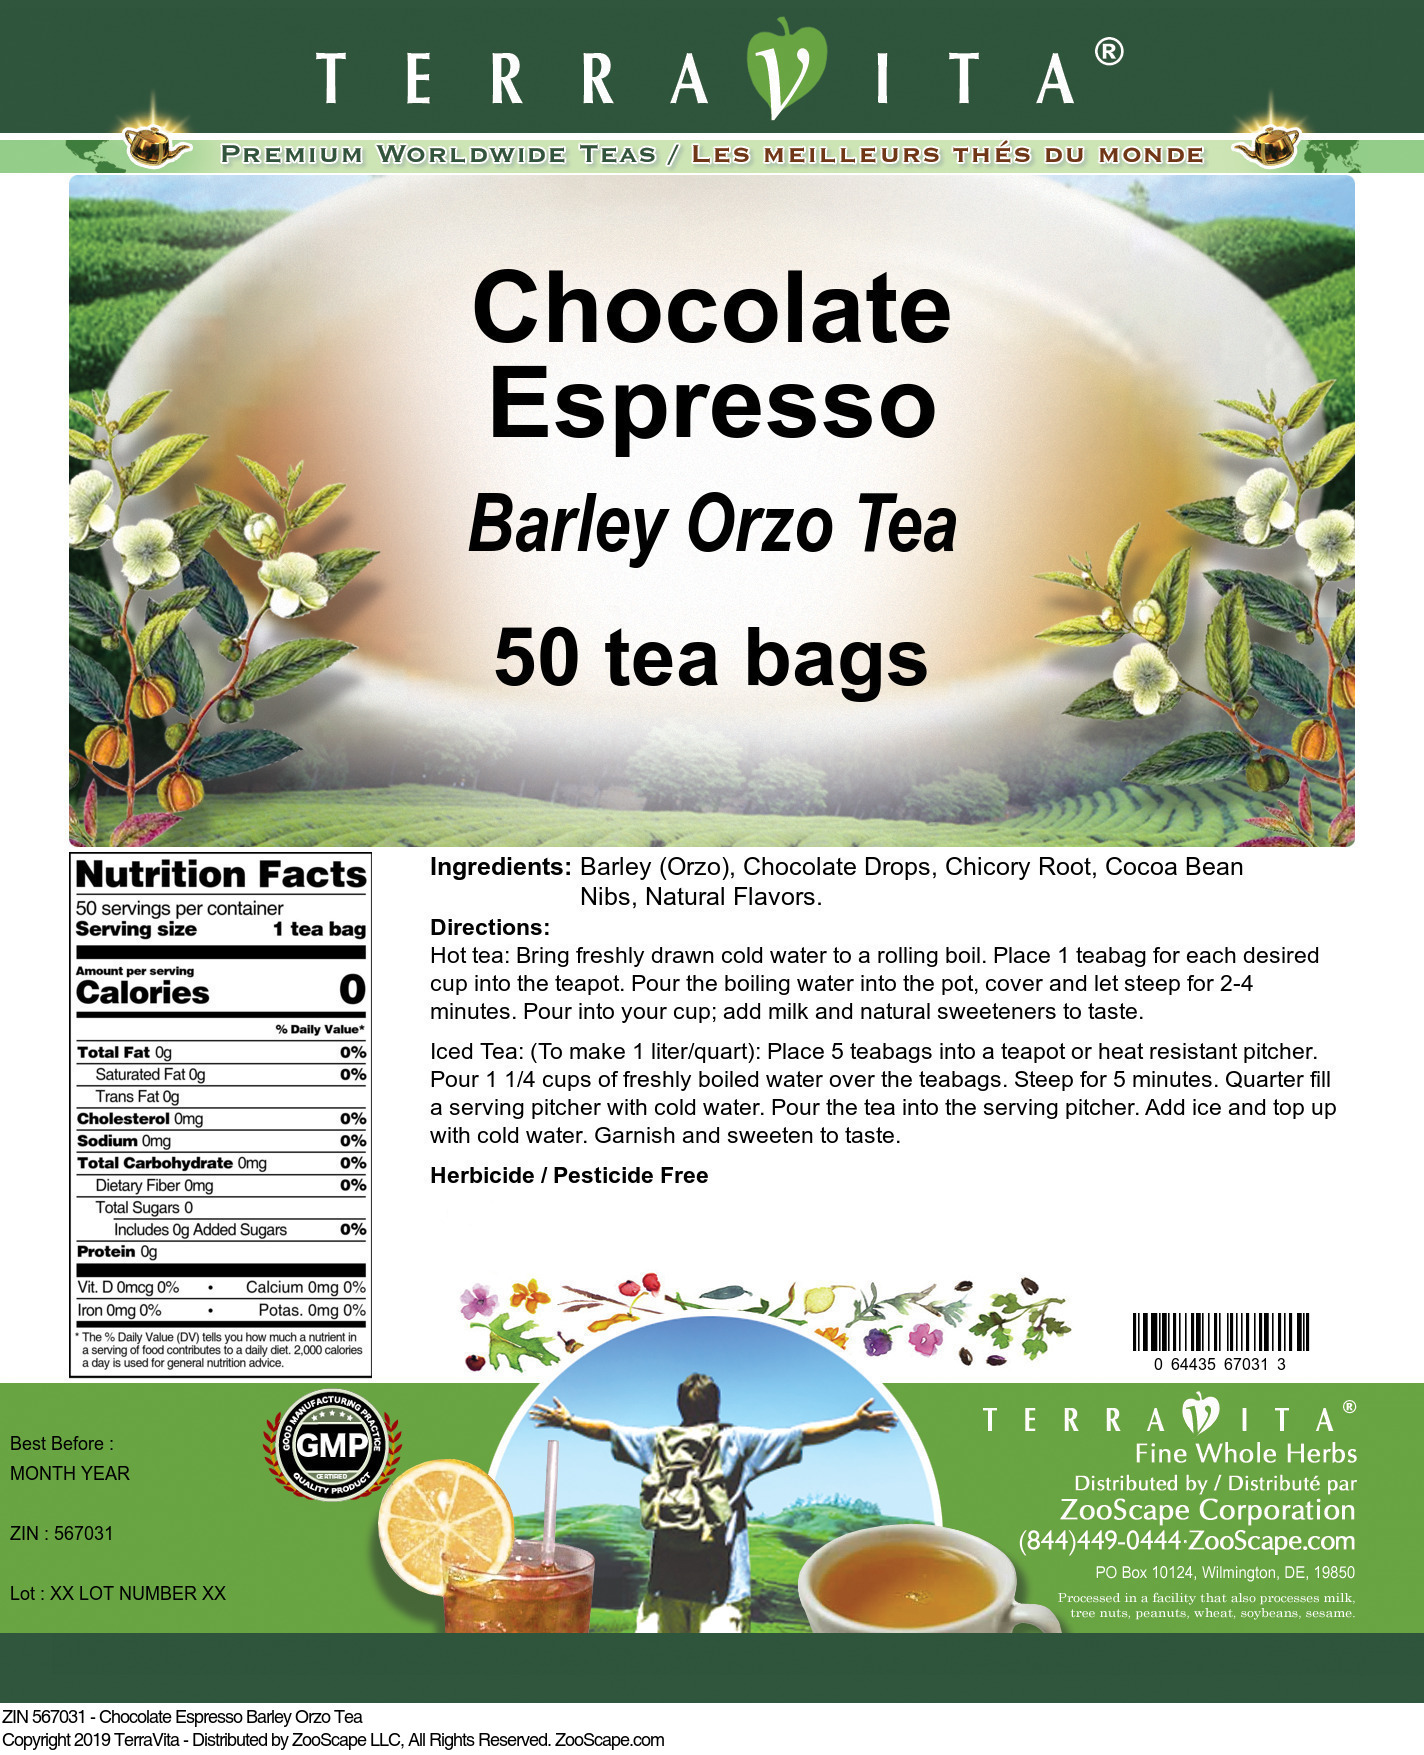 Chocolate Espresso Barley Orzo Tea